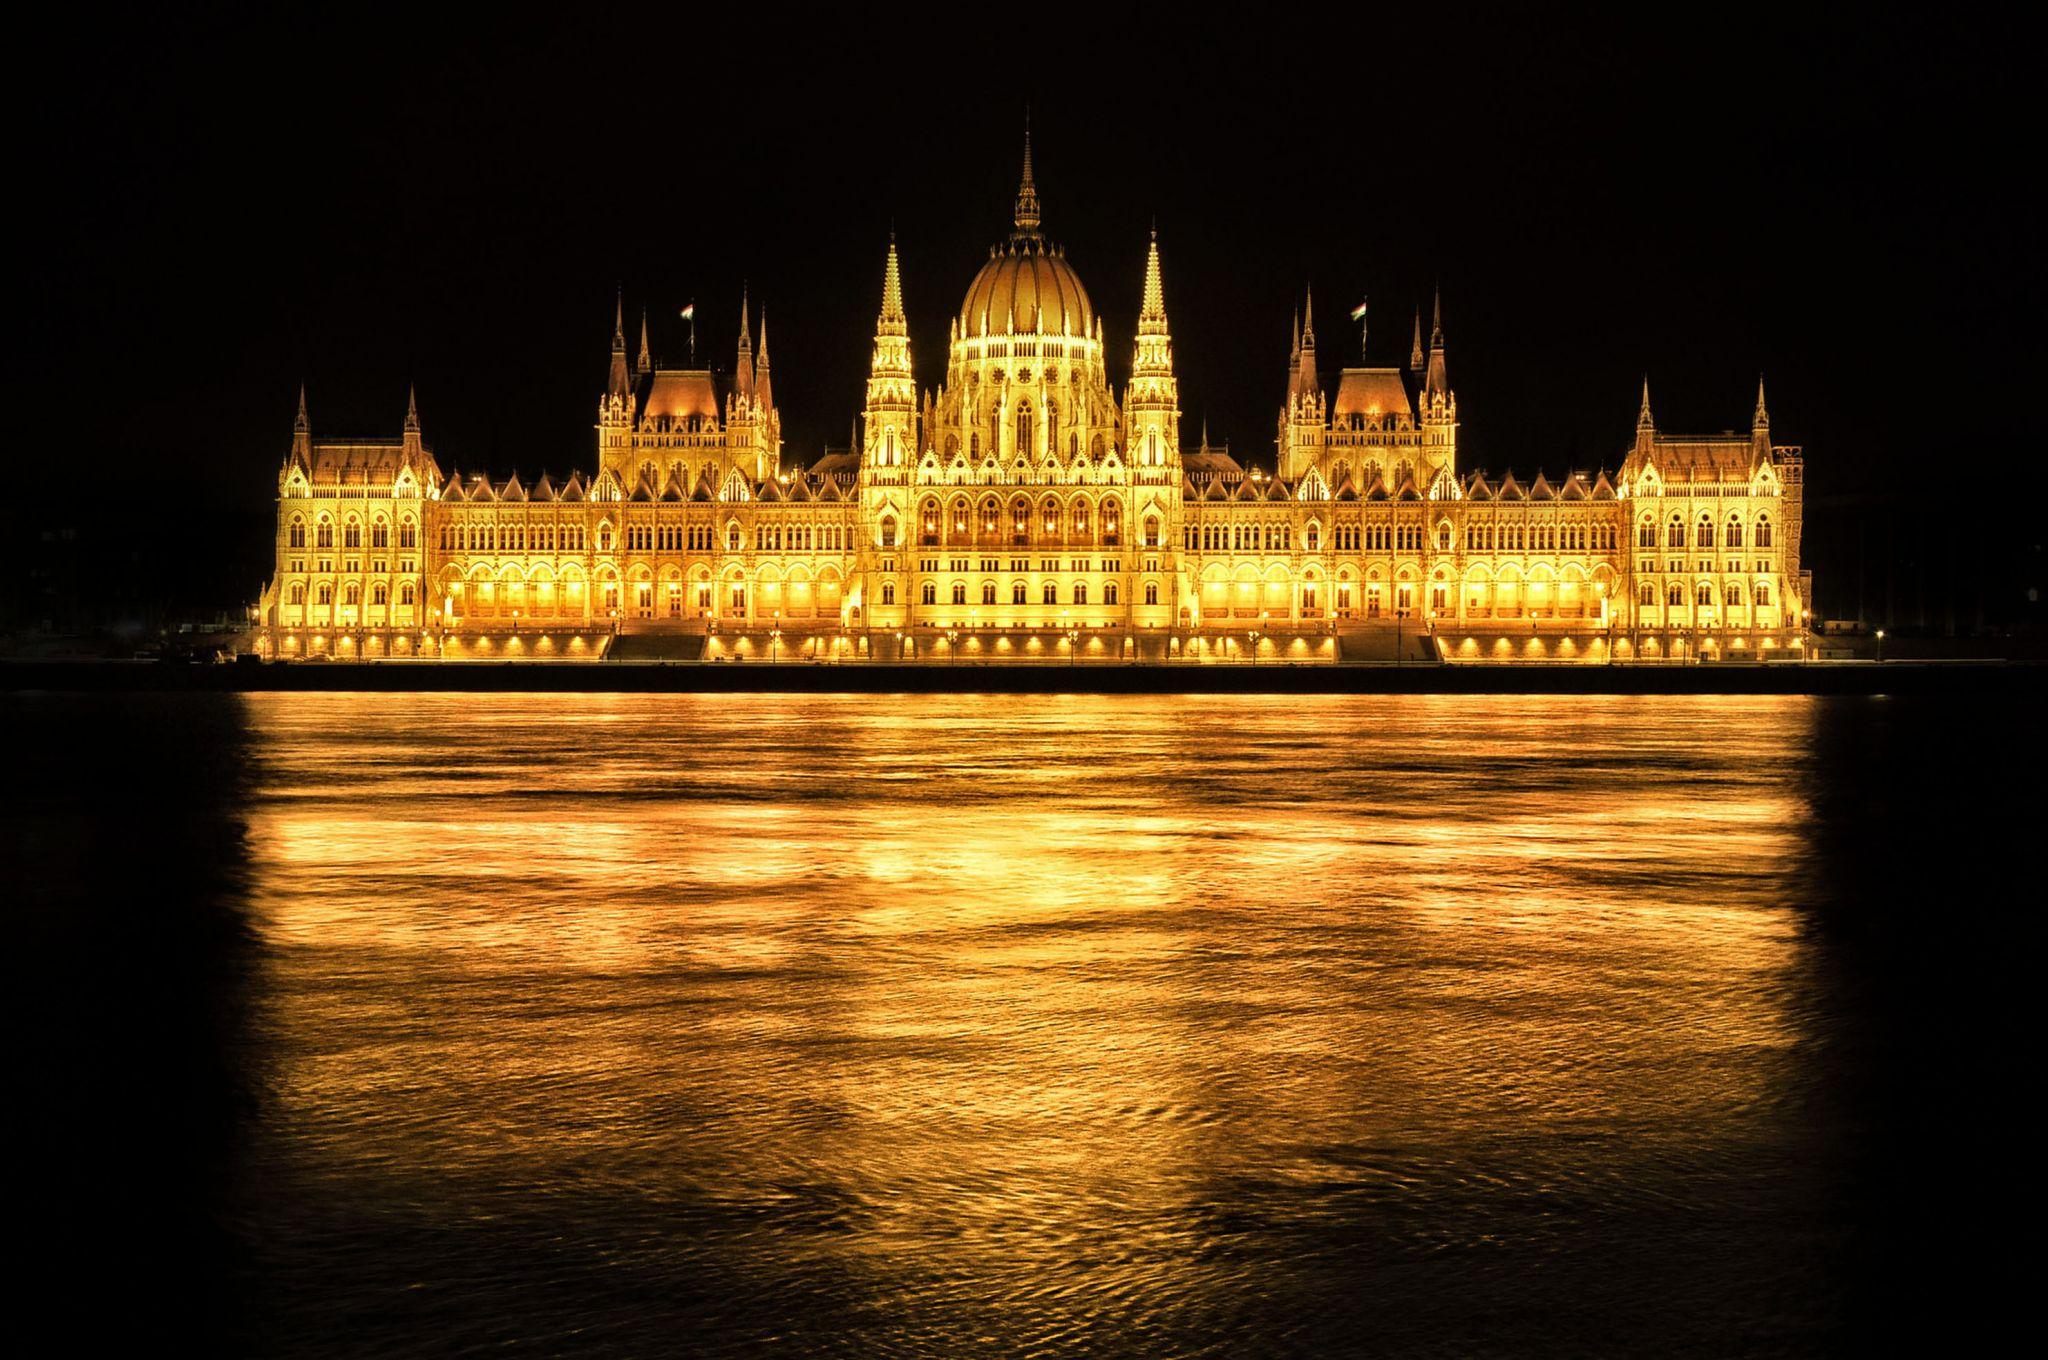 Hungarian Parliament, Hungary